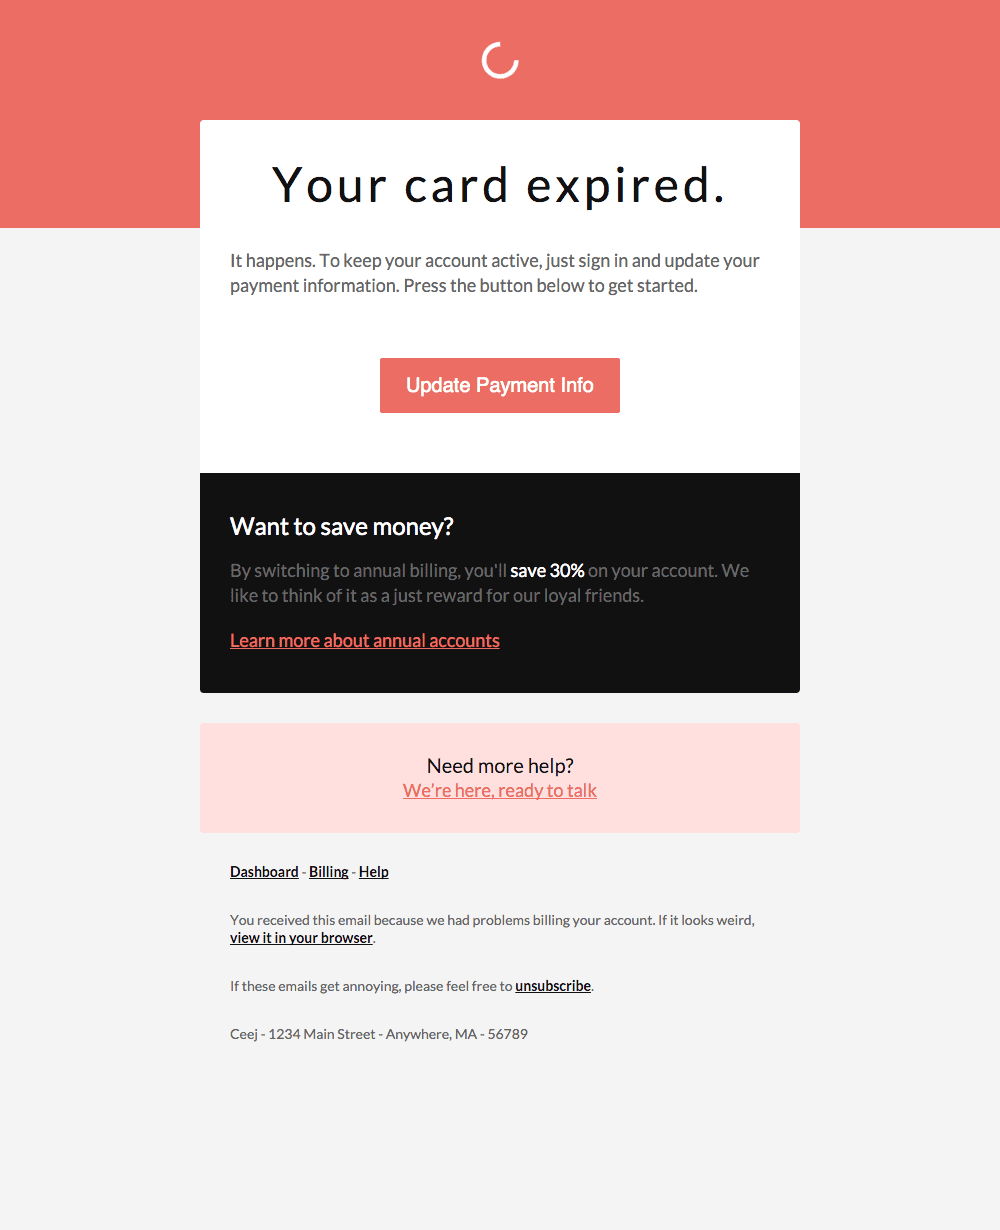 template email carte bleue expirée